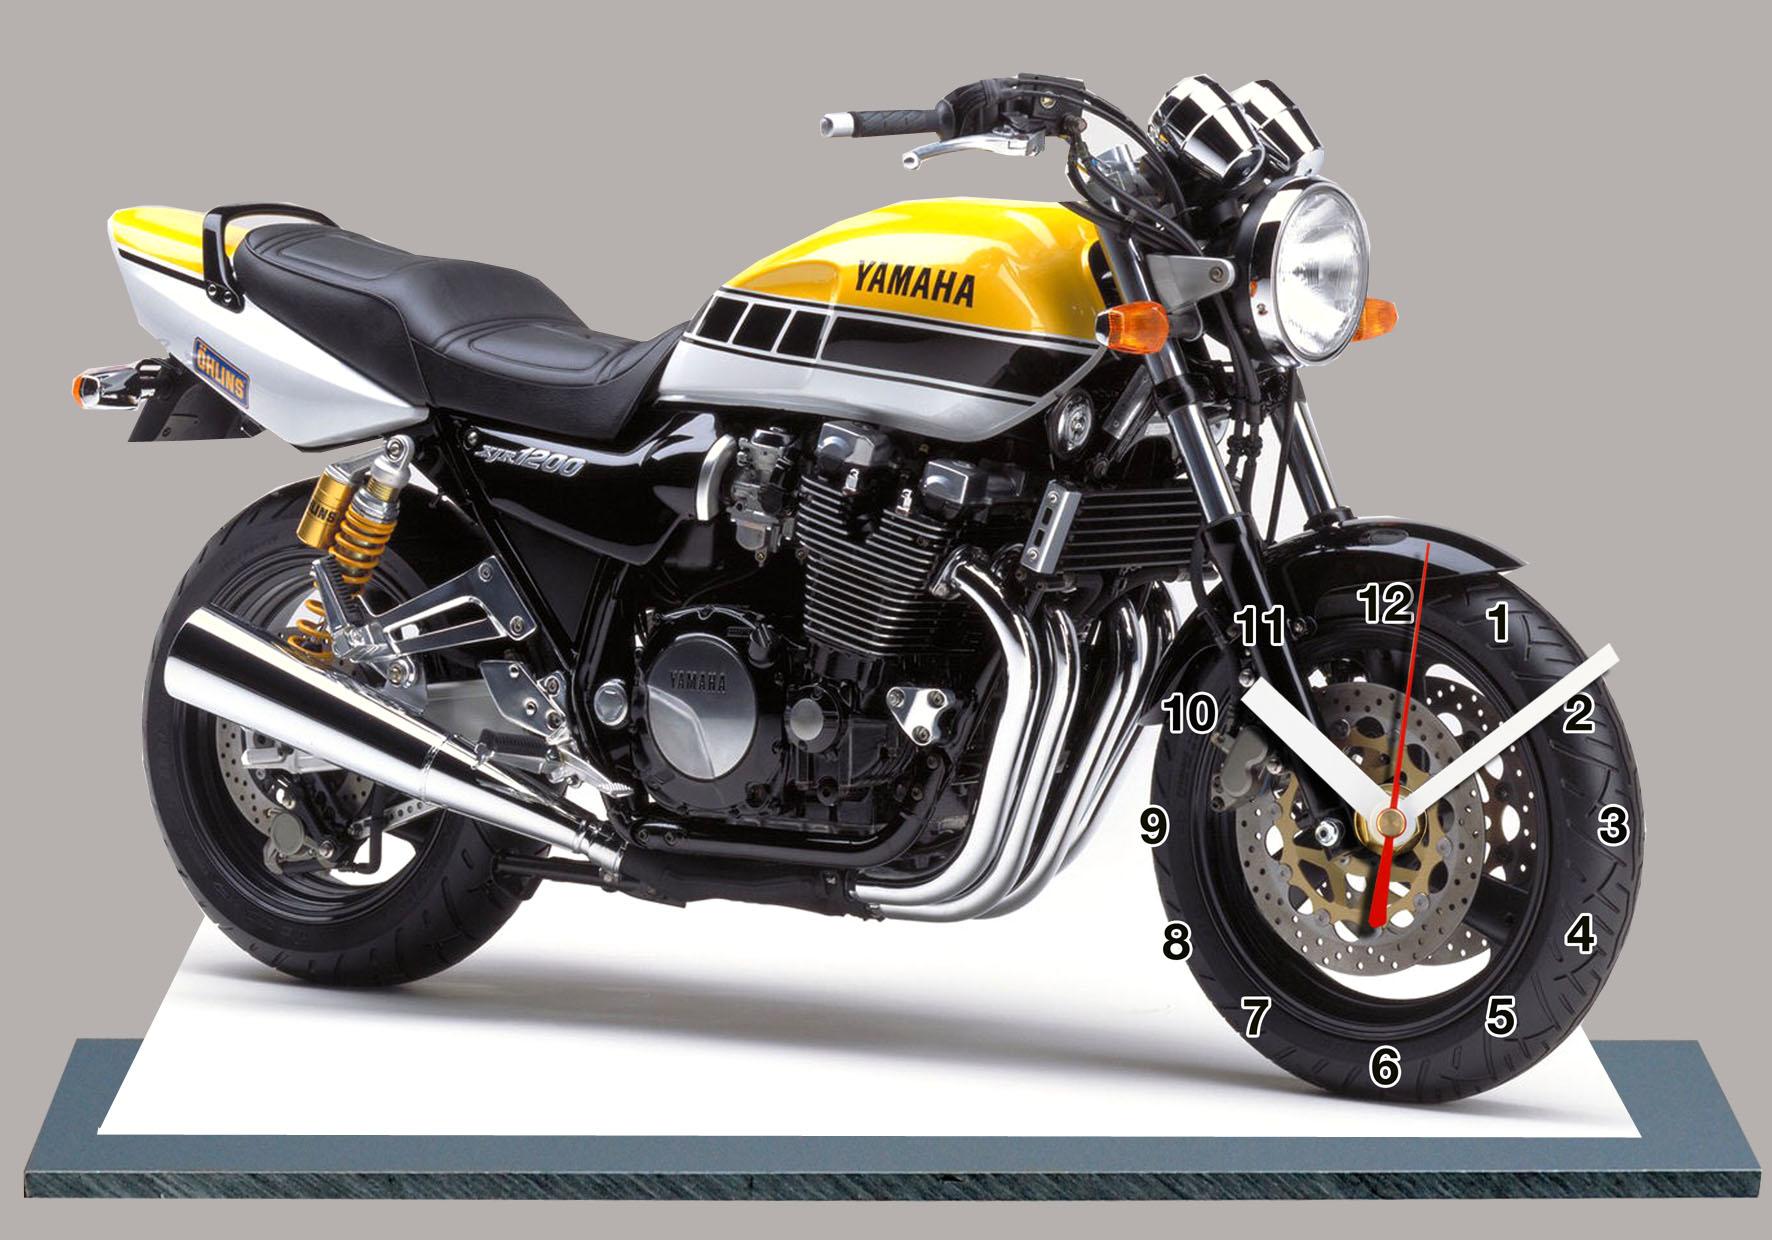 maquette moto yamaha xjr 1300. Black Bedroom Furniture Sets. Home Design Ideas